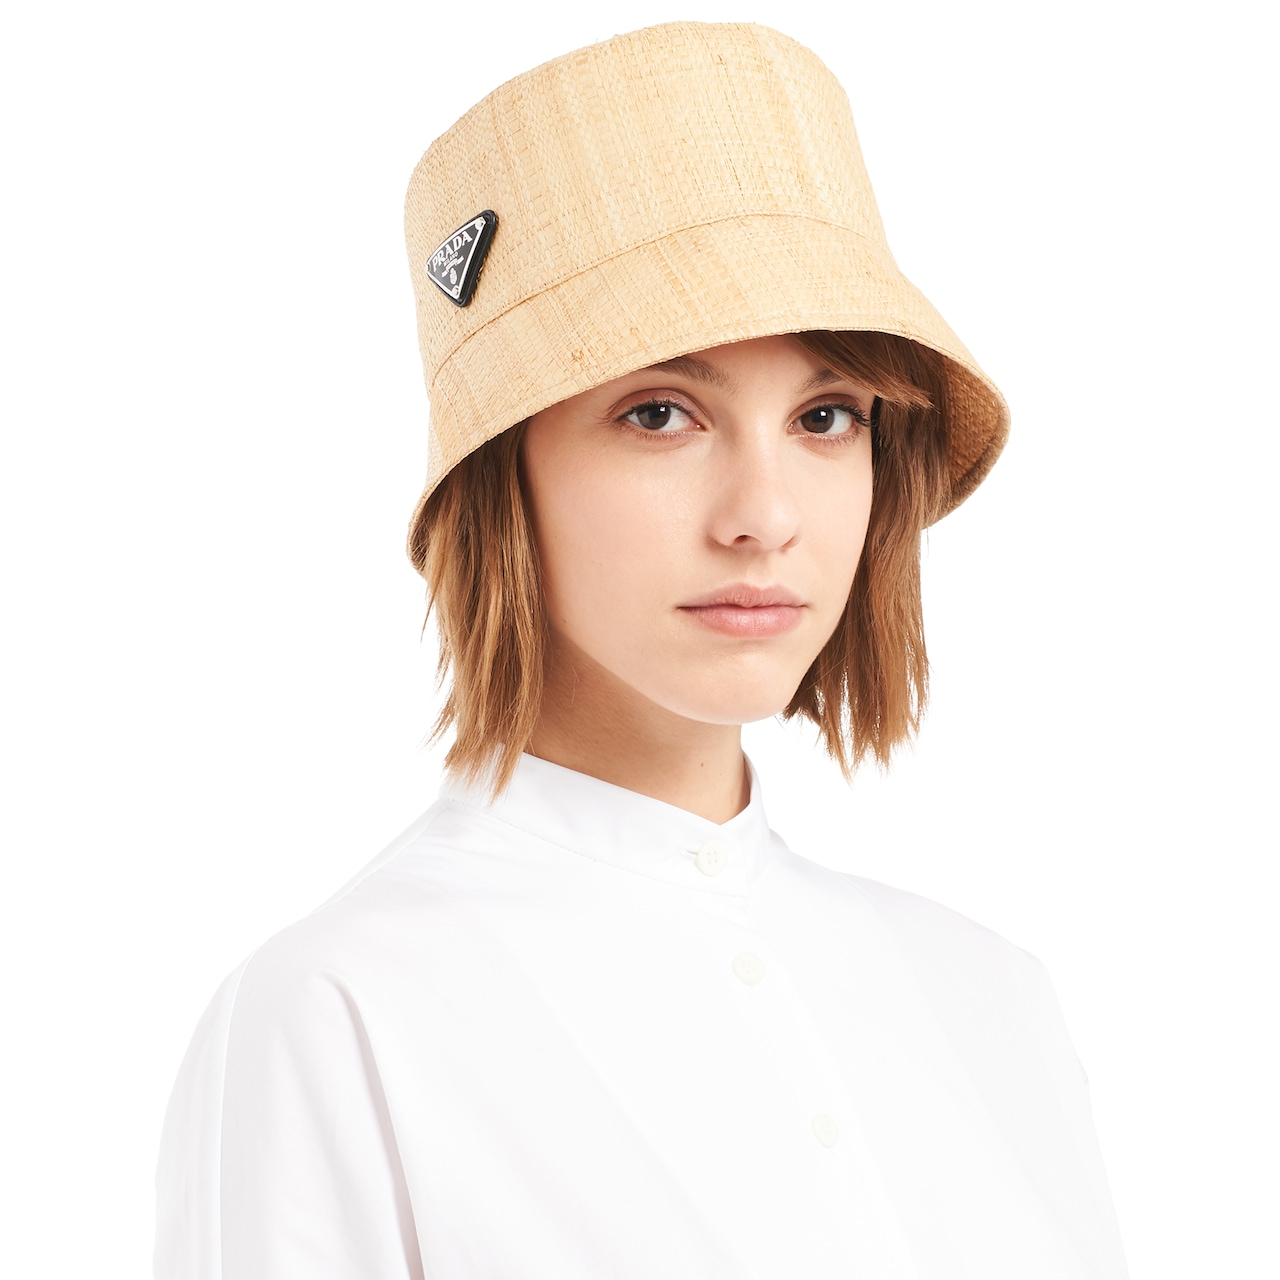 Prada Straw hat 2